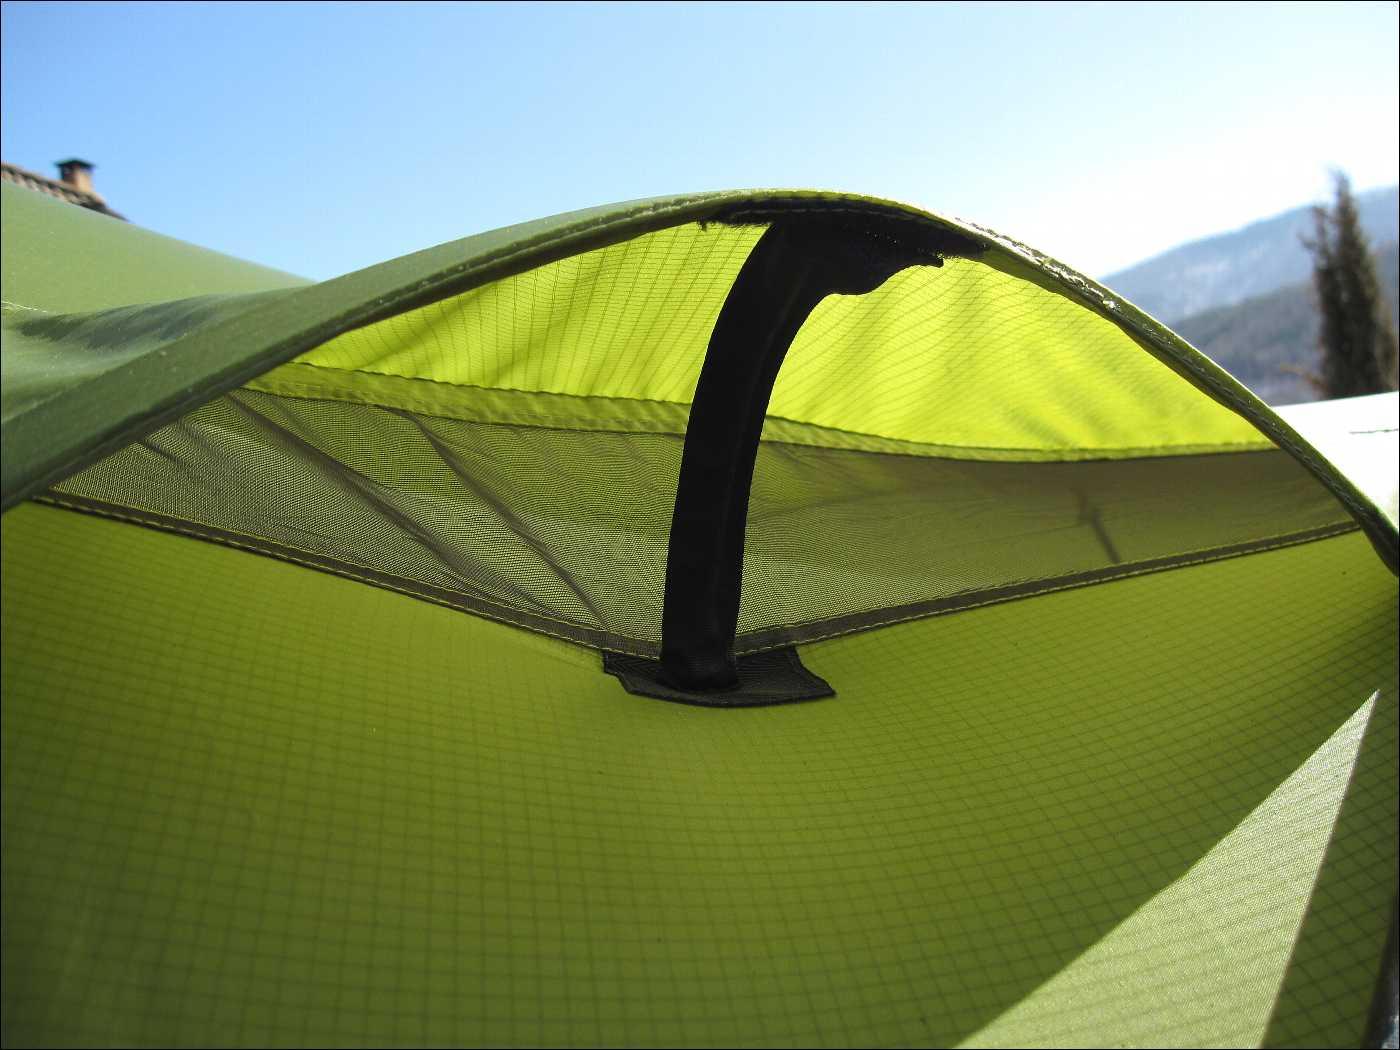 Tente-Mountain-Equipment-Dragonfly-2-XT_14_hr.jpg